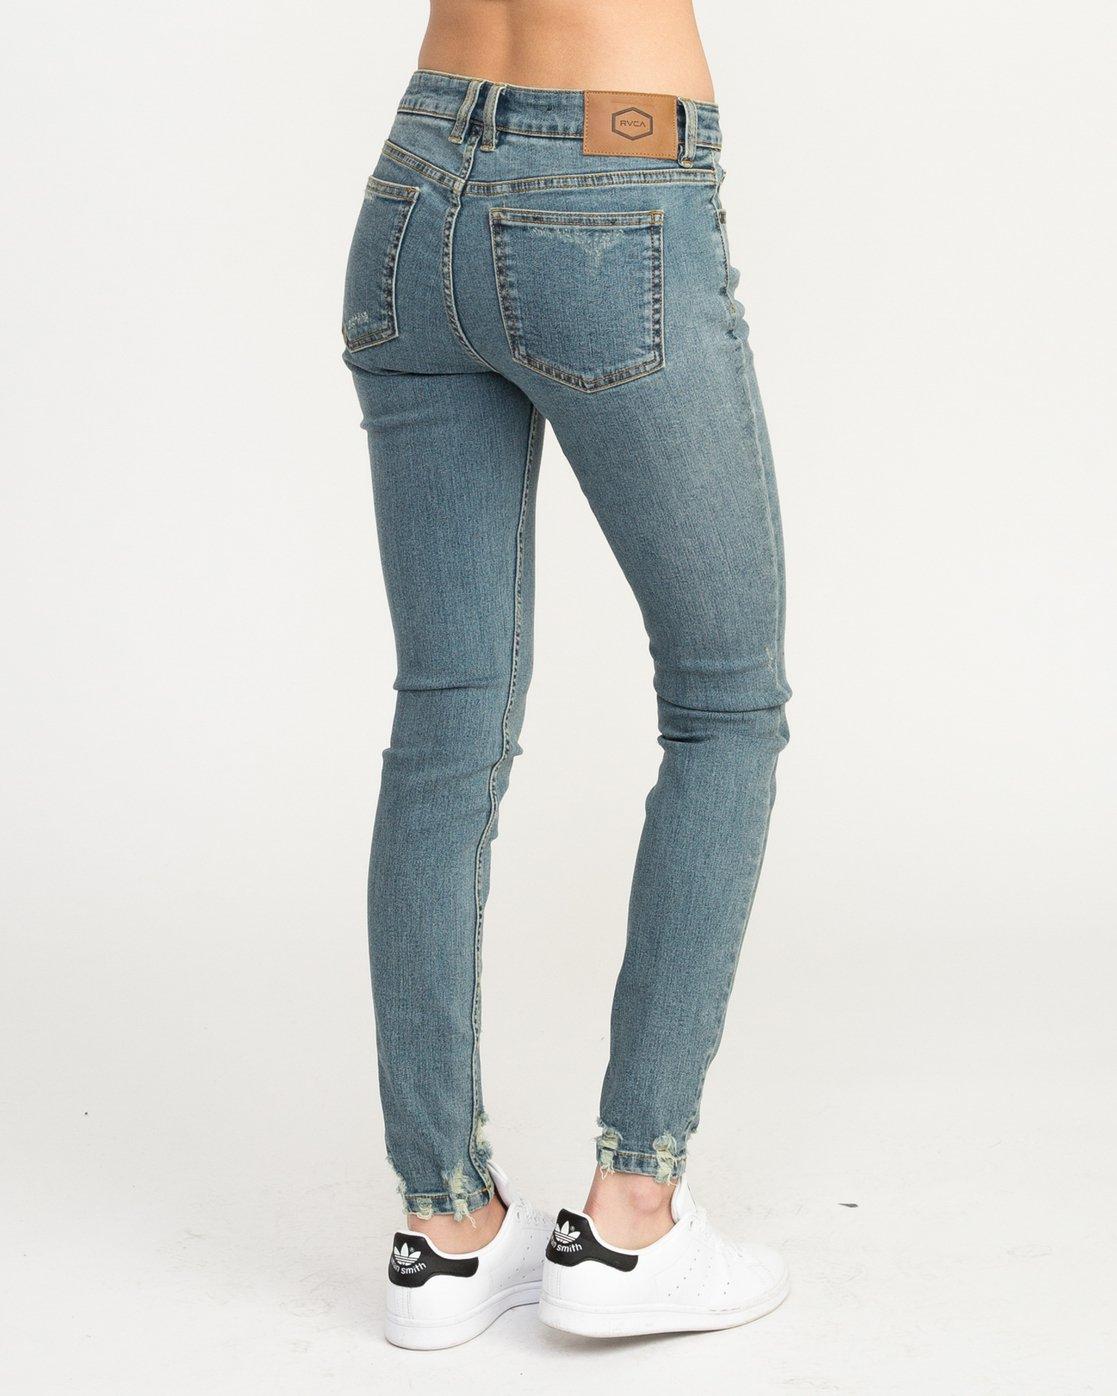 3 Dayley Mid Rise Denim Jeans Blue WCDP02DA RVCA